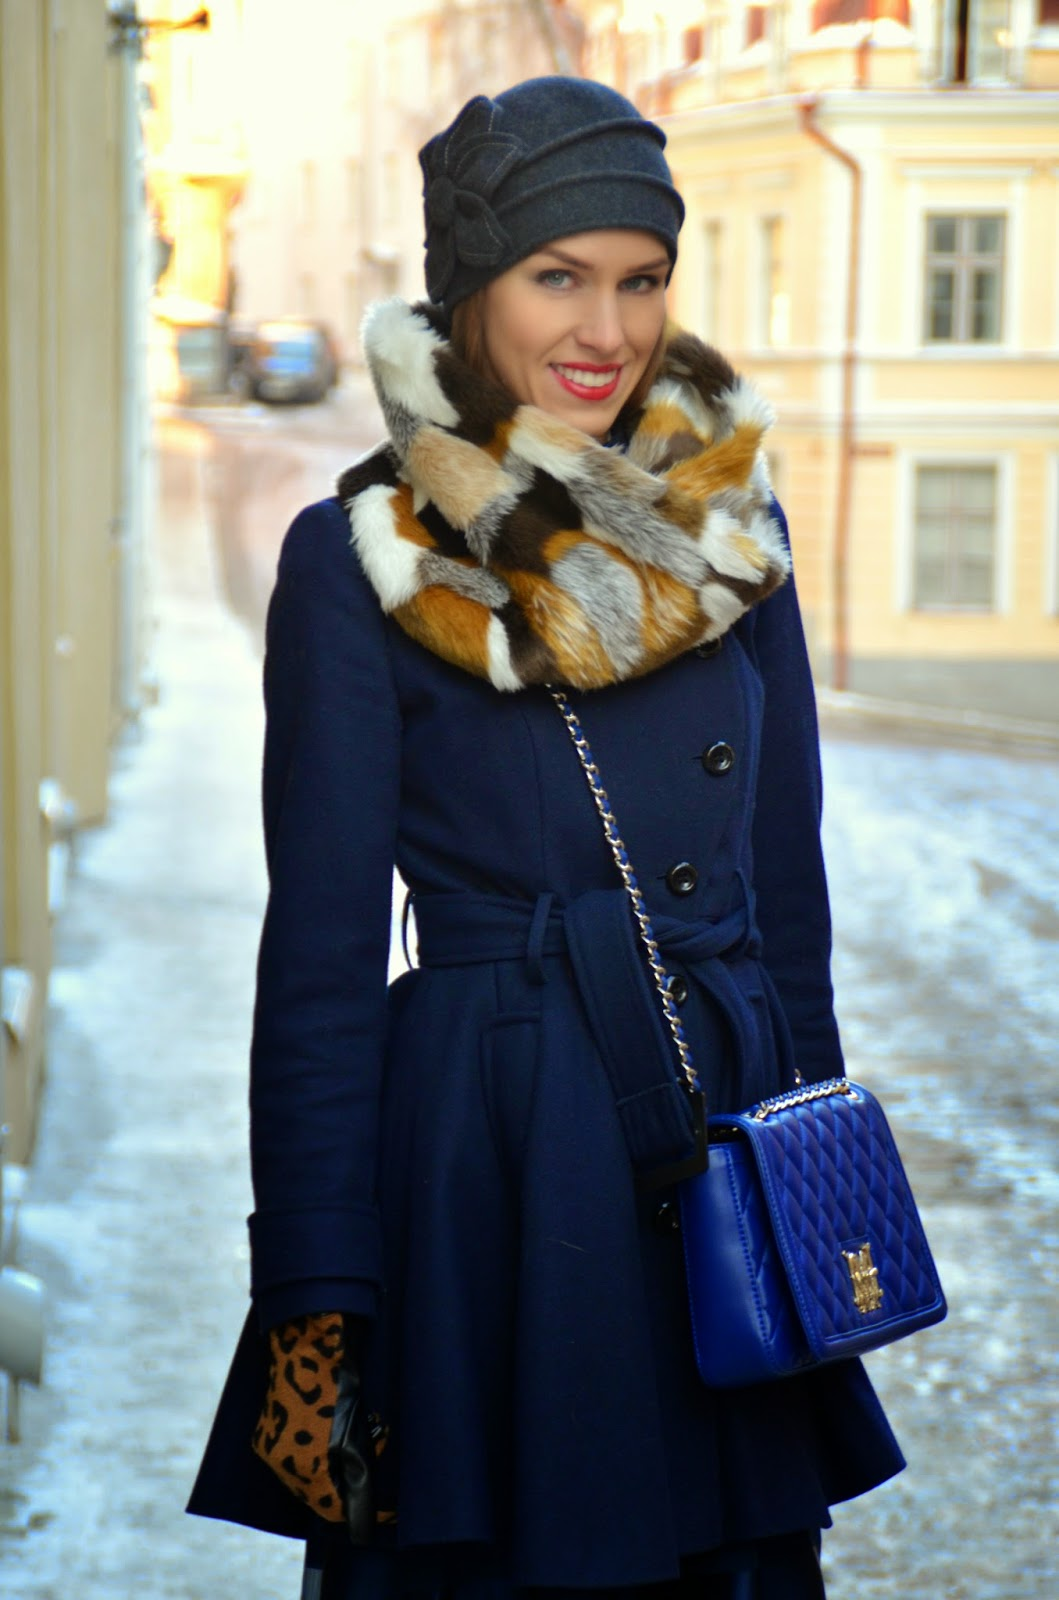 gina-tricot-fur-snood-asos-wool-coat-moschino-blue-bag